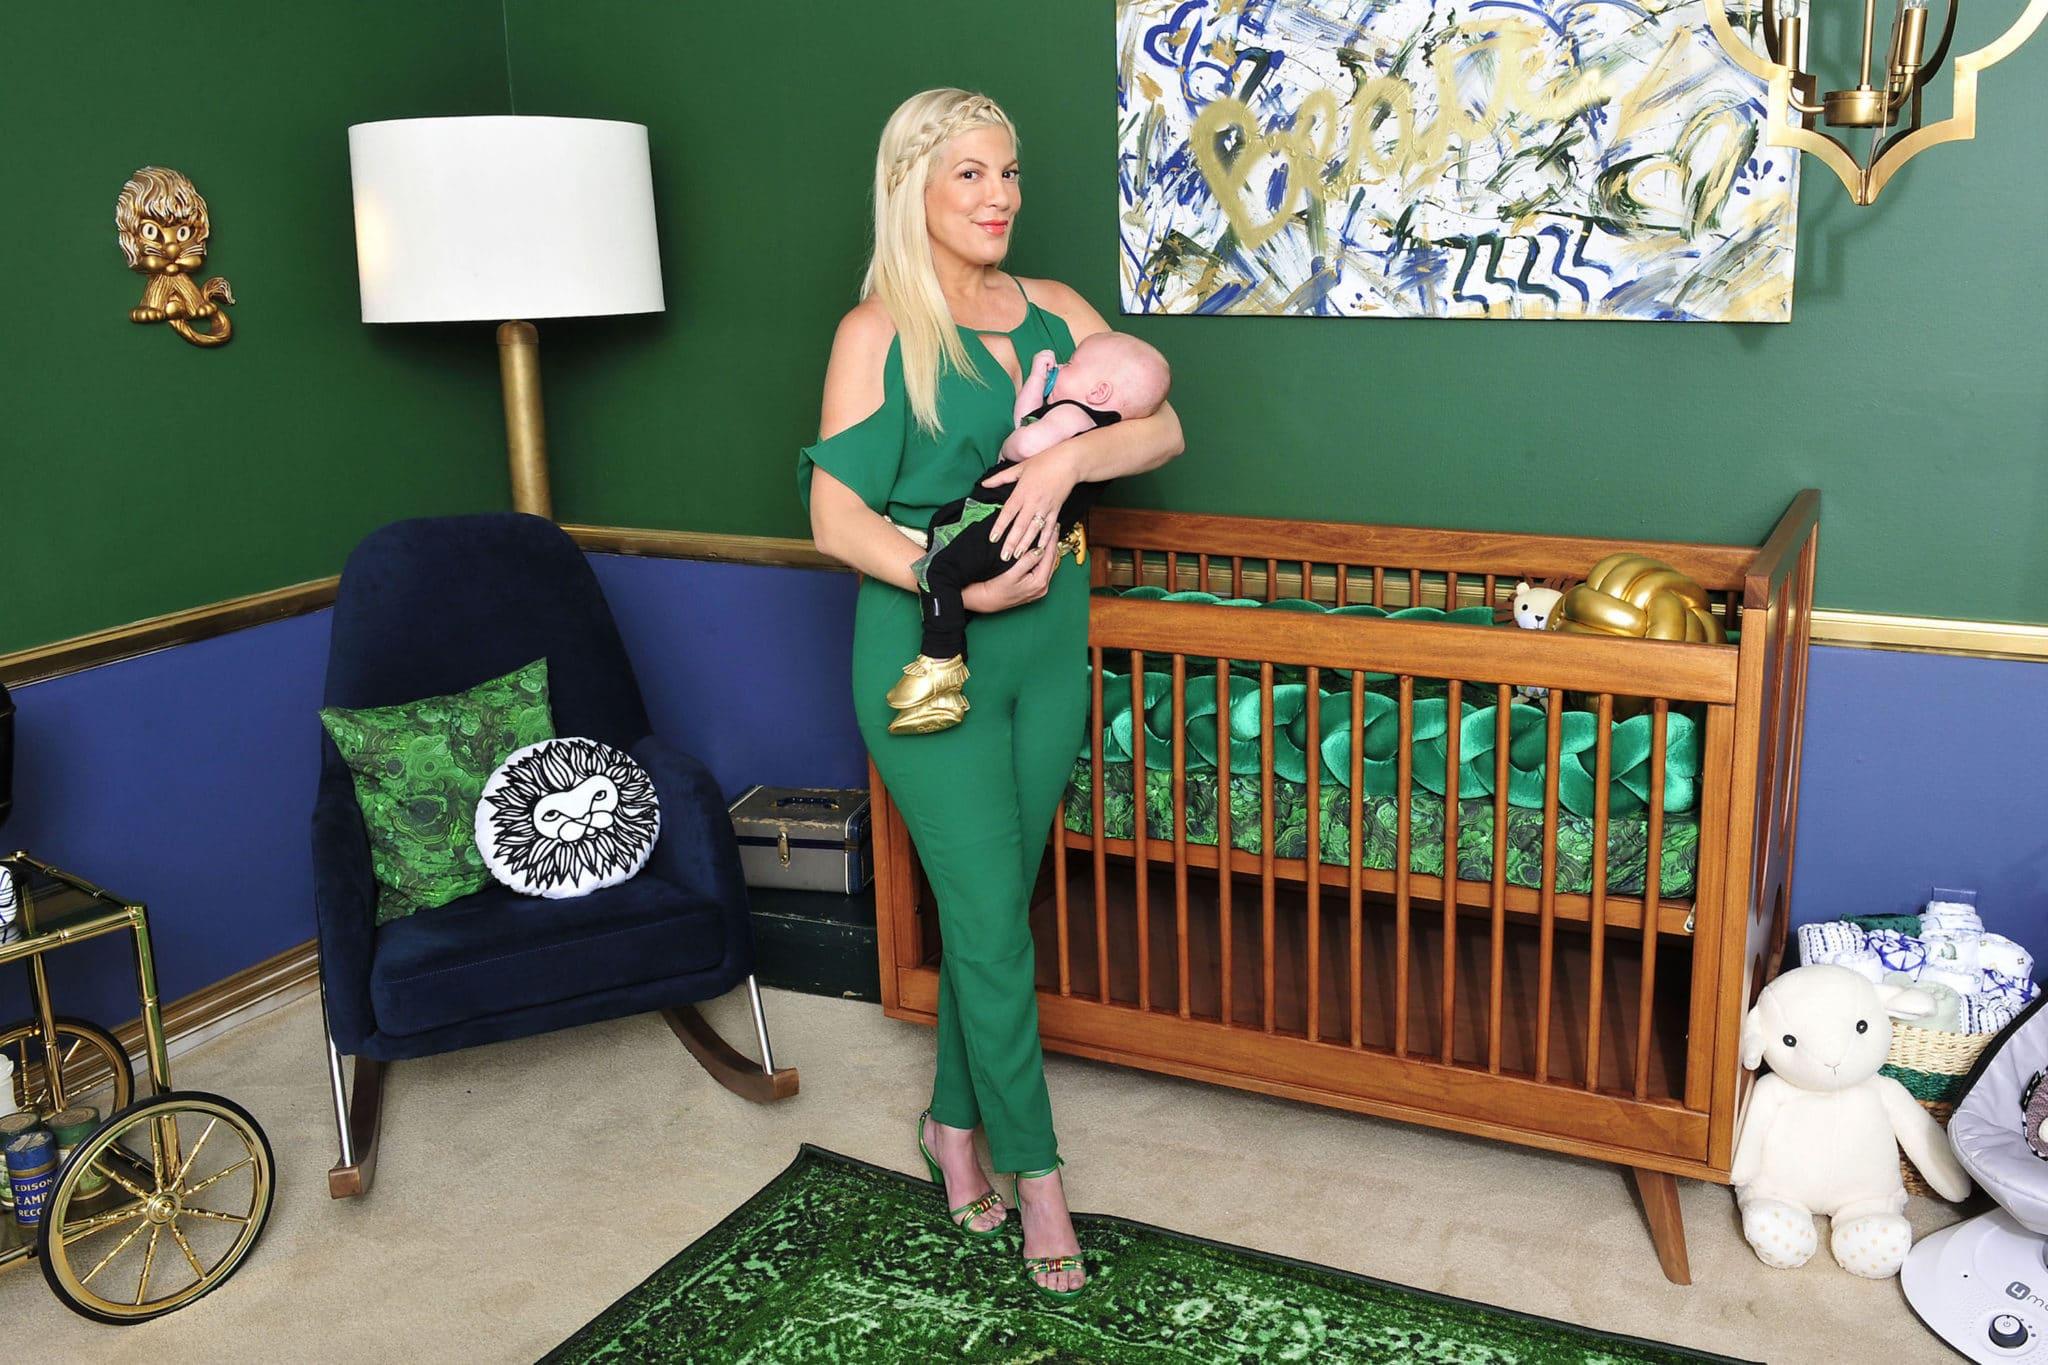 Nursery Design Trends Advice From Celebrity Designer: Celebrity Design Reveal: Tori Spelling's Malachite Nursery